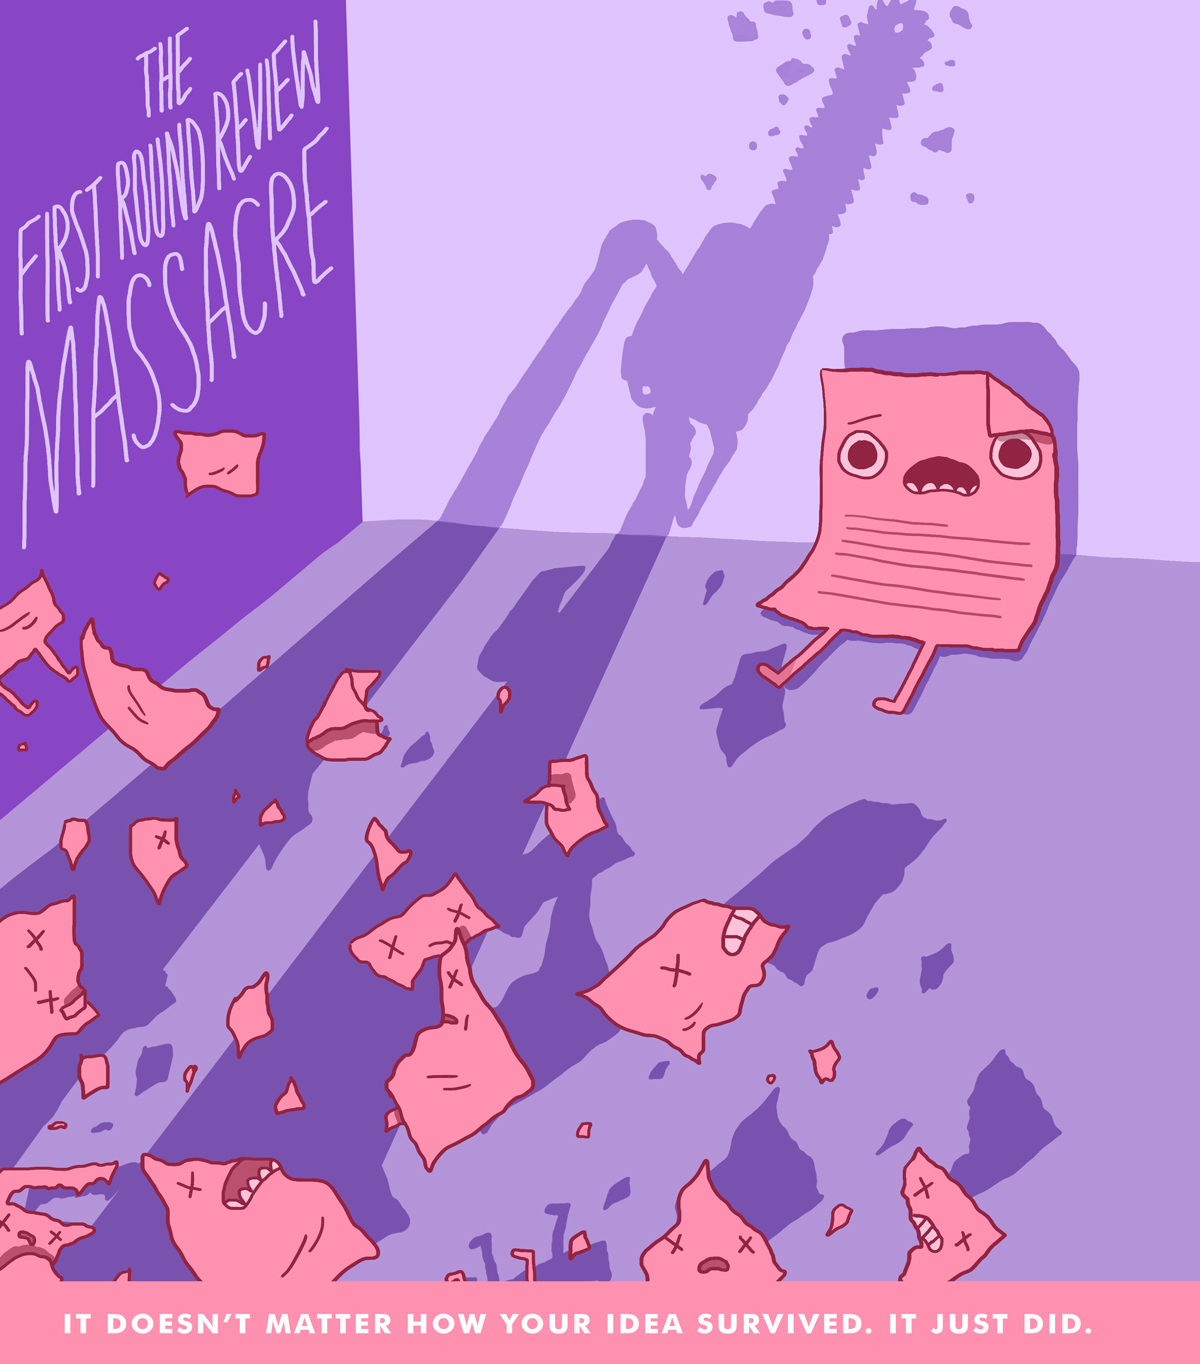 ADDYS-massacre-post_1200.jpg